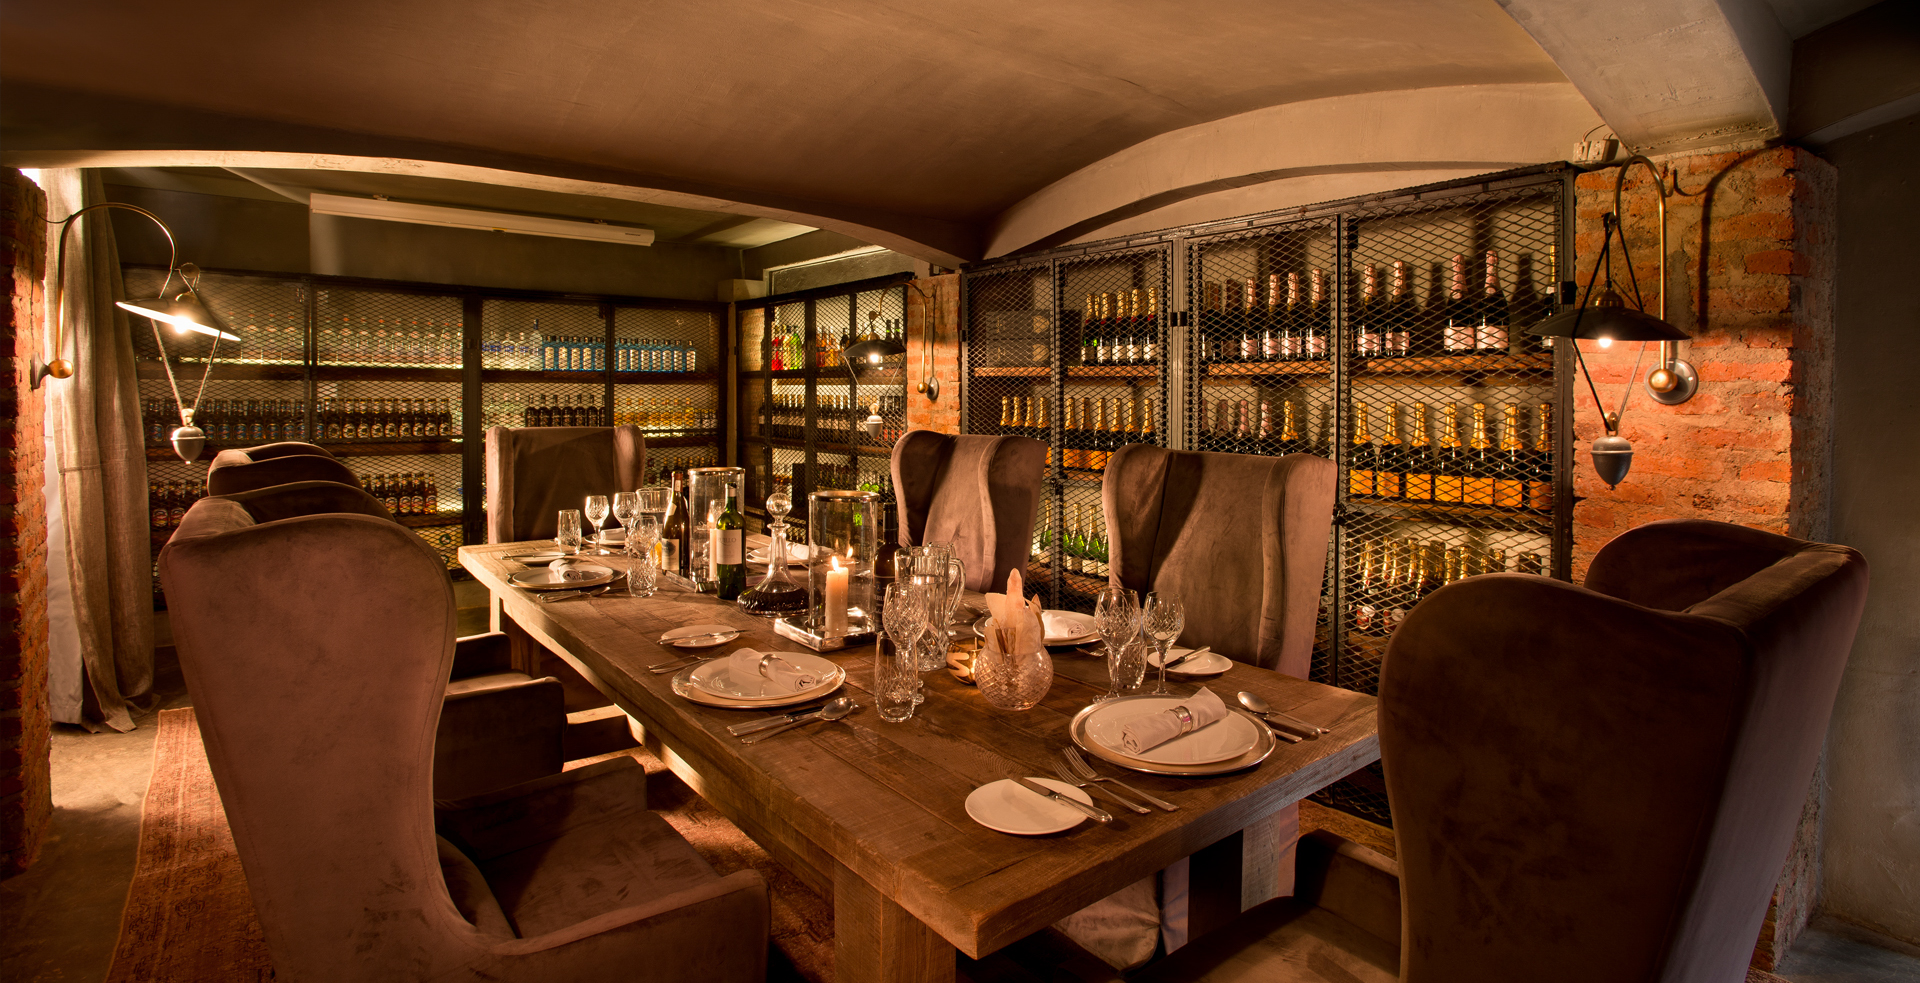 andbeyond-ngorongoro-crater-lodge-wine-store